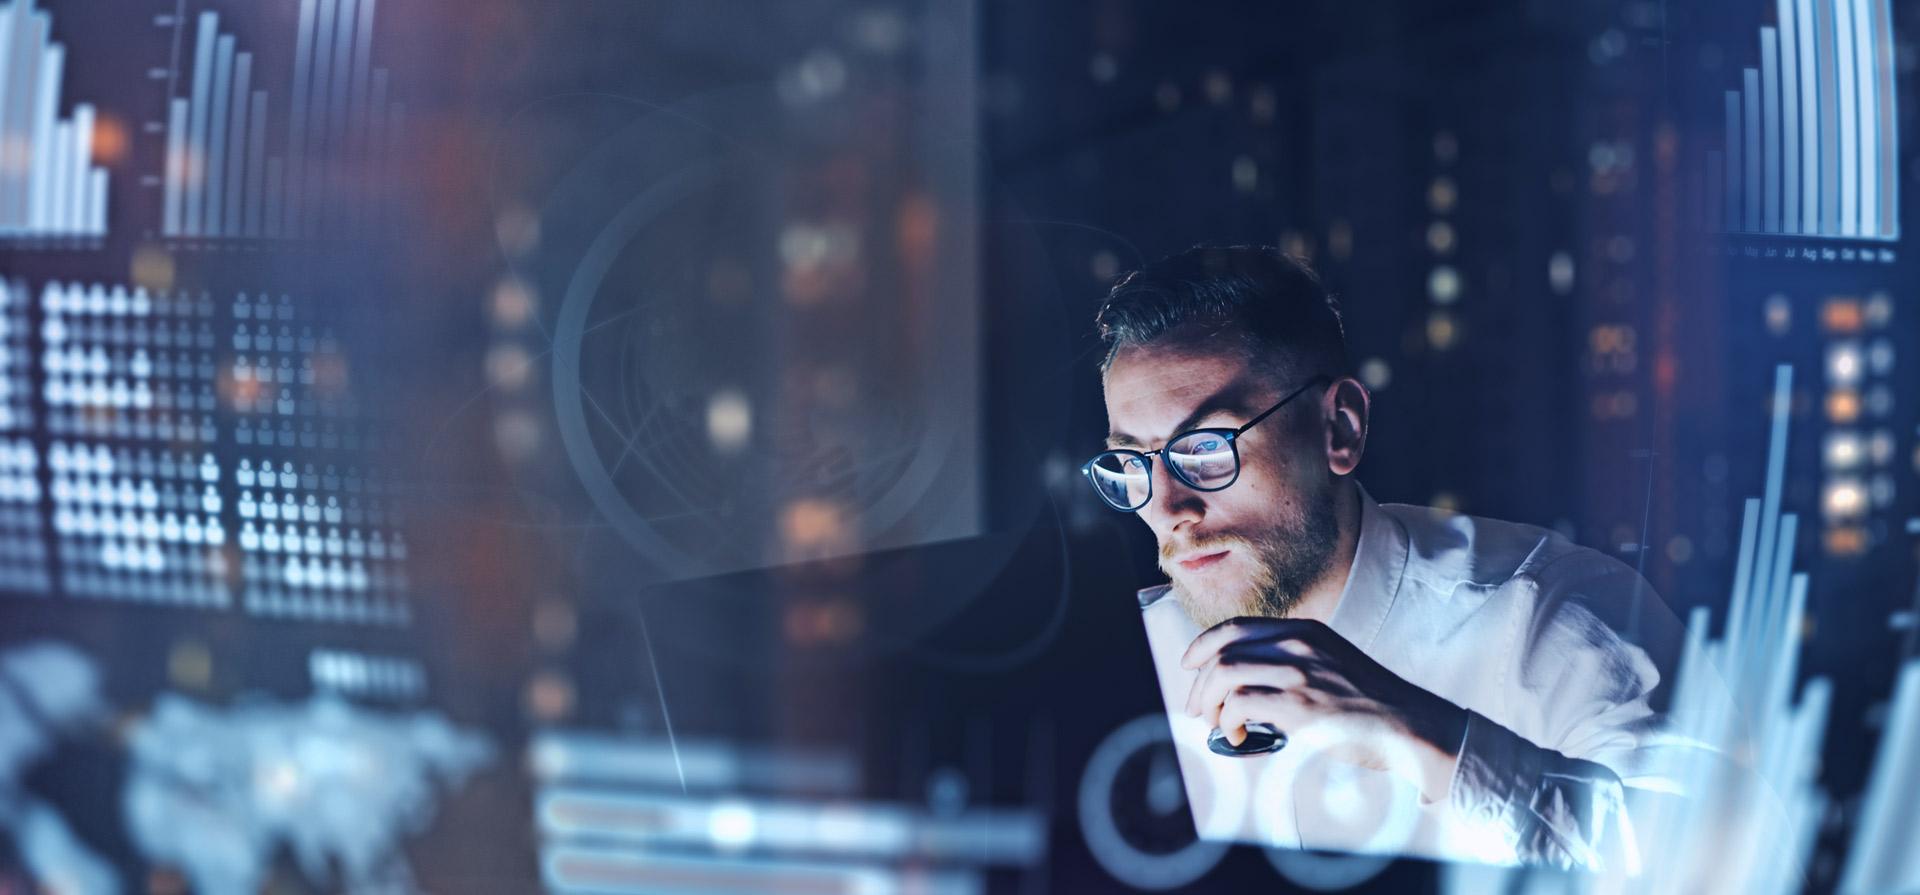 Reinsurance risk mitigation using digital risk management solutions